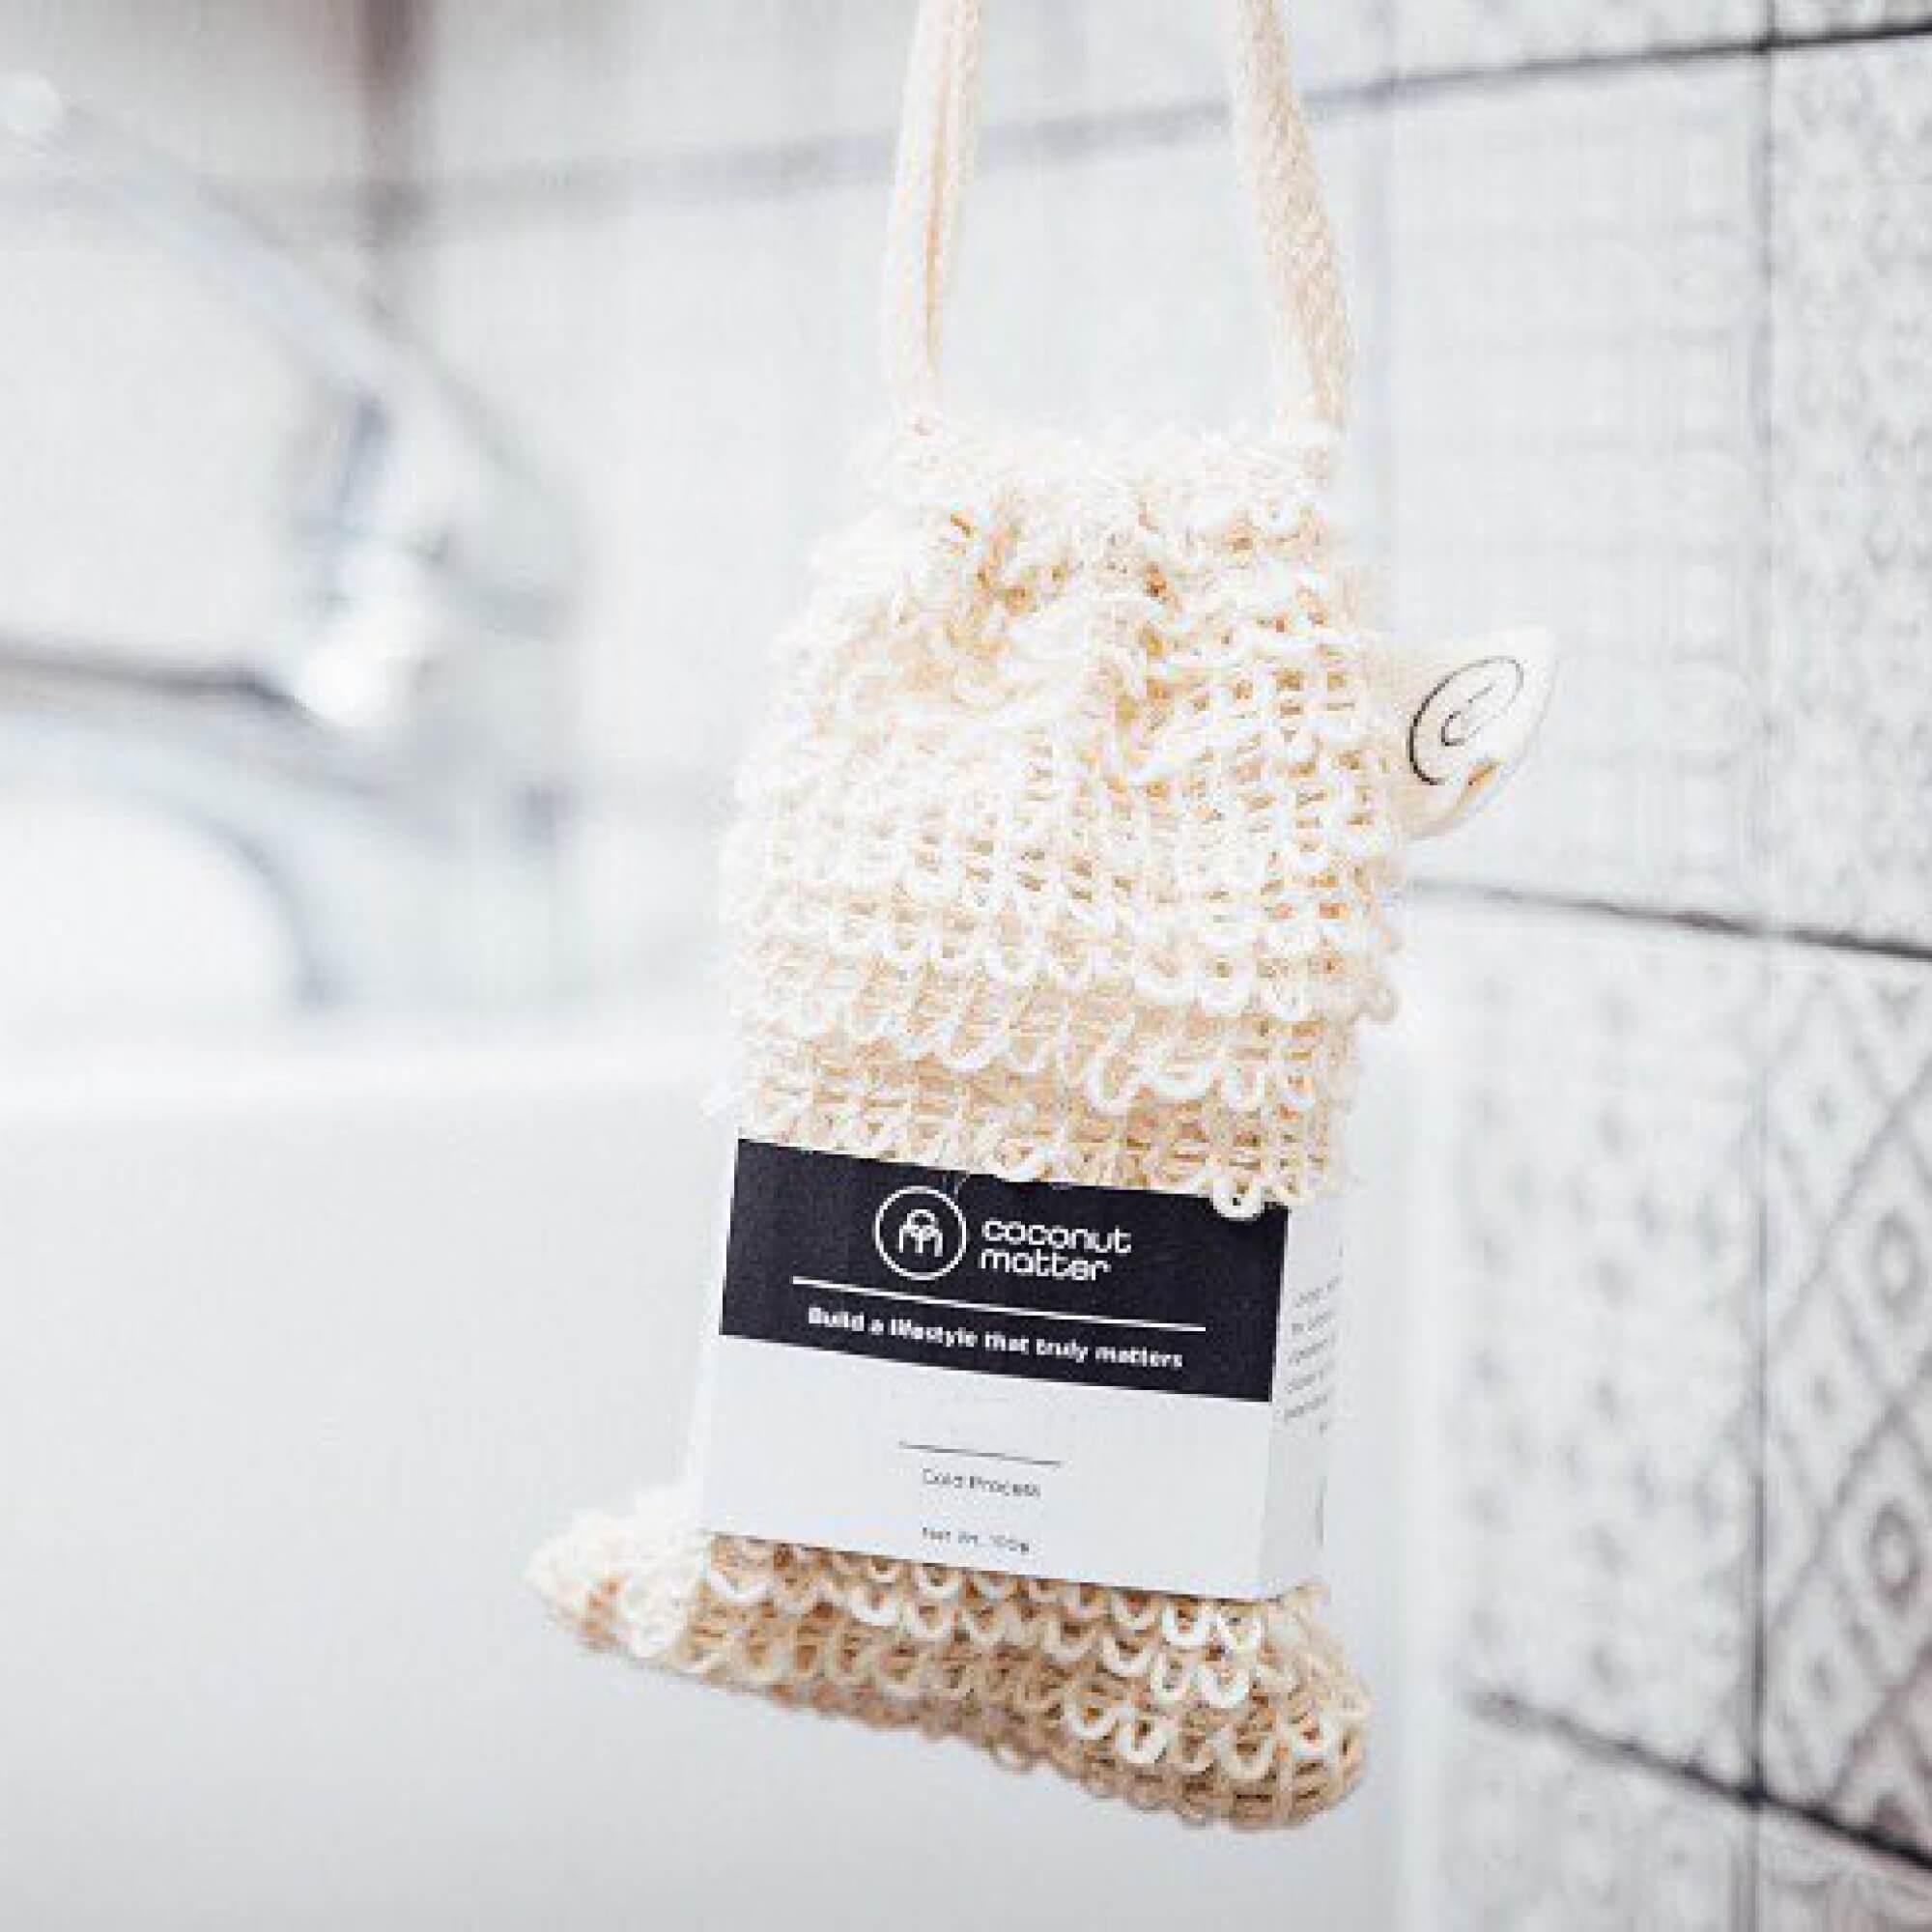 Coconut Matter 劍麻纖維肥皂起泡袋